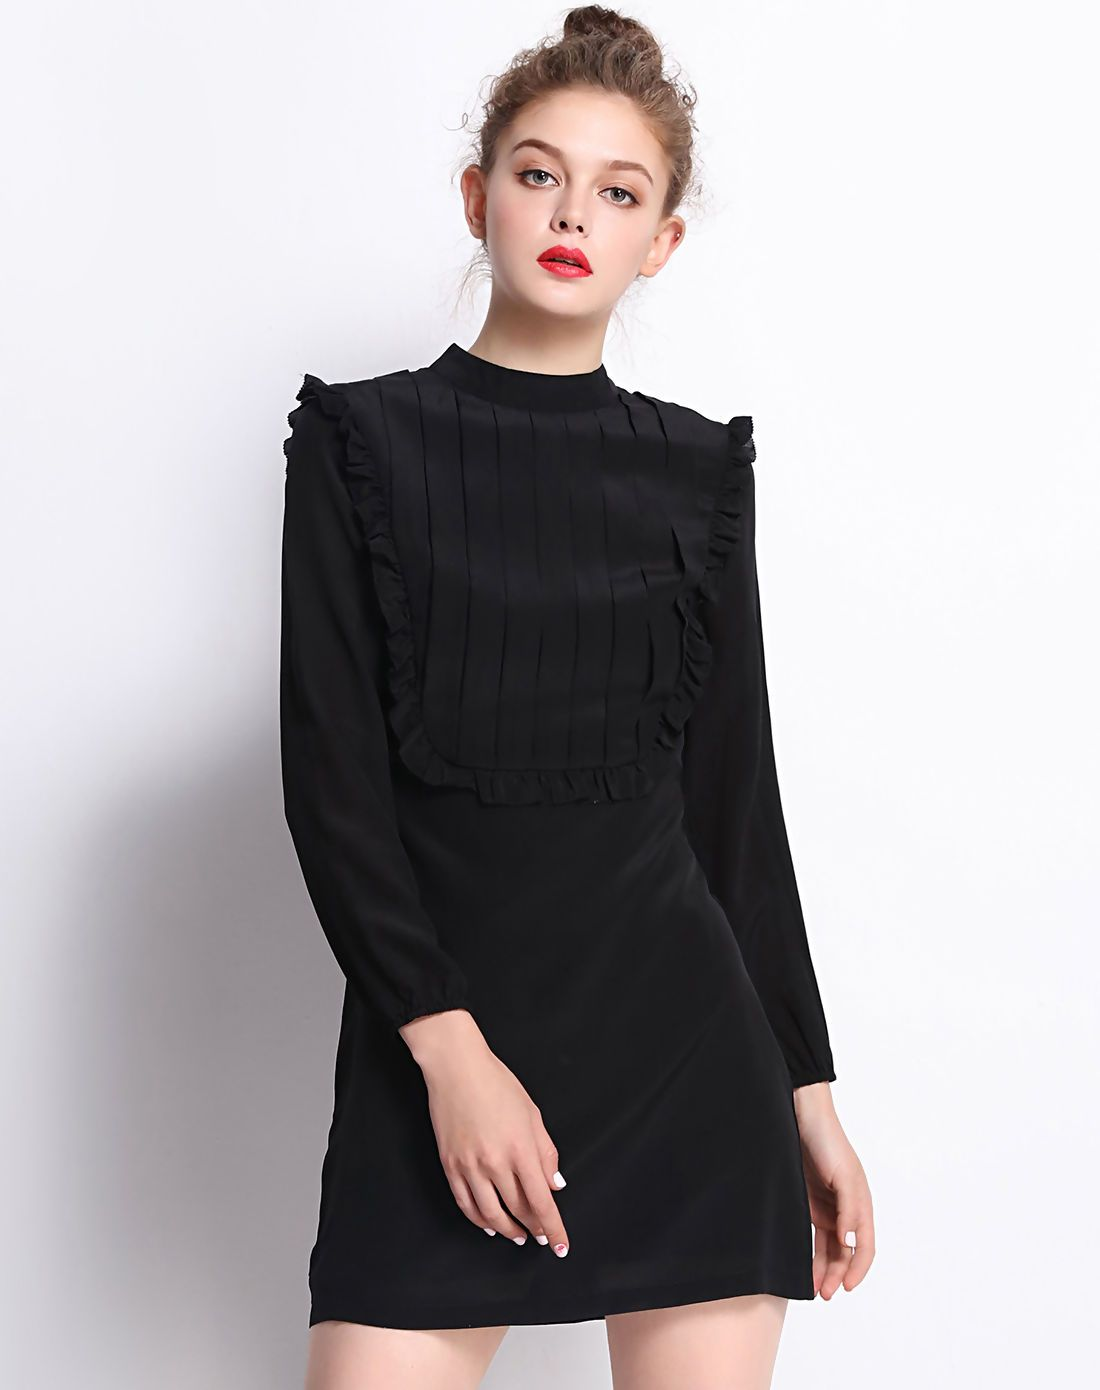 Short western style wedding dresses  AdoreWe VIPme ALine Dresses  Fantiow Black Mock Neck Silk Ruffles